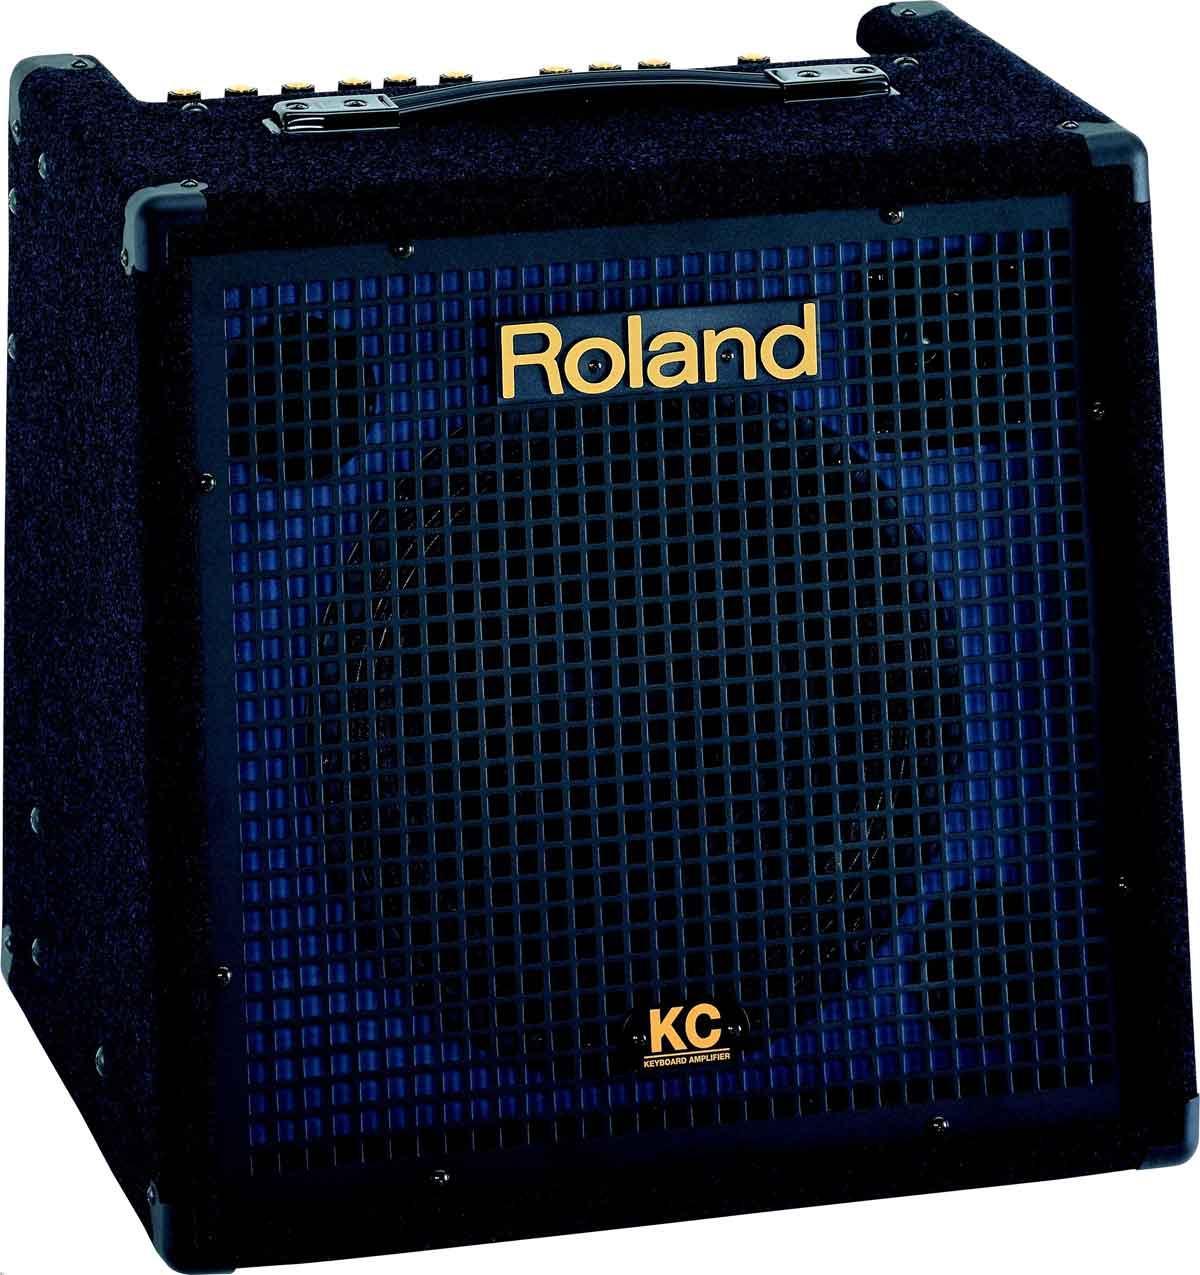 roland kc350 keyboard amplifier 120 watt. Black Bedroom Furniture Sets. Home Design Ideas